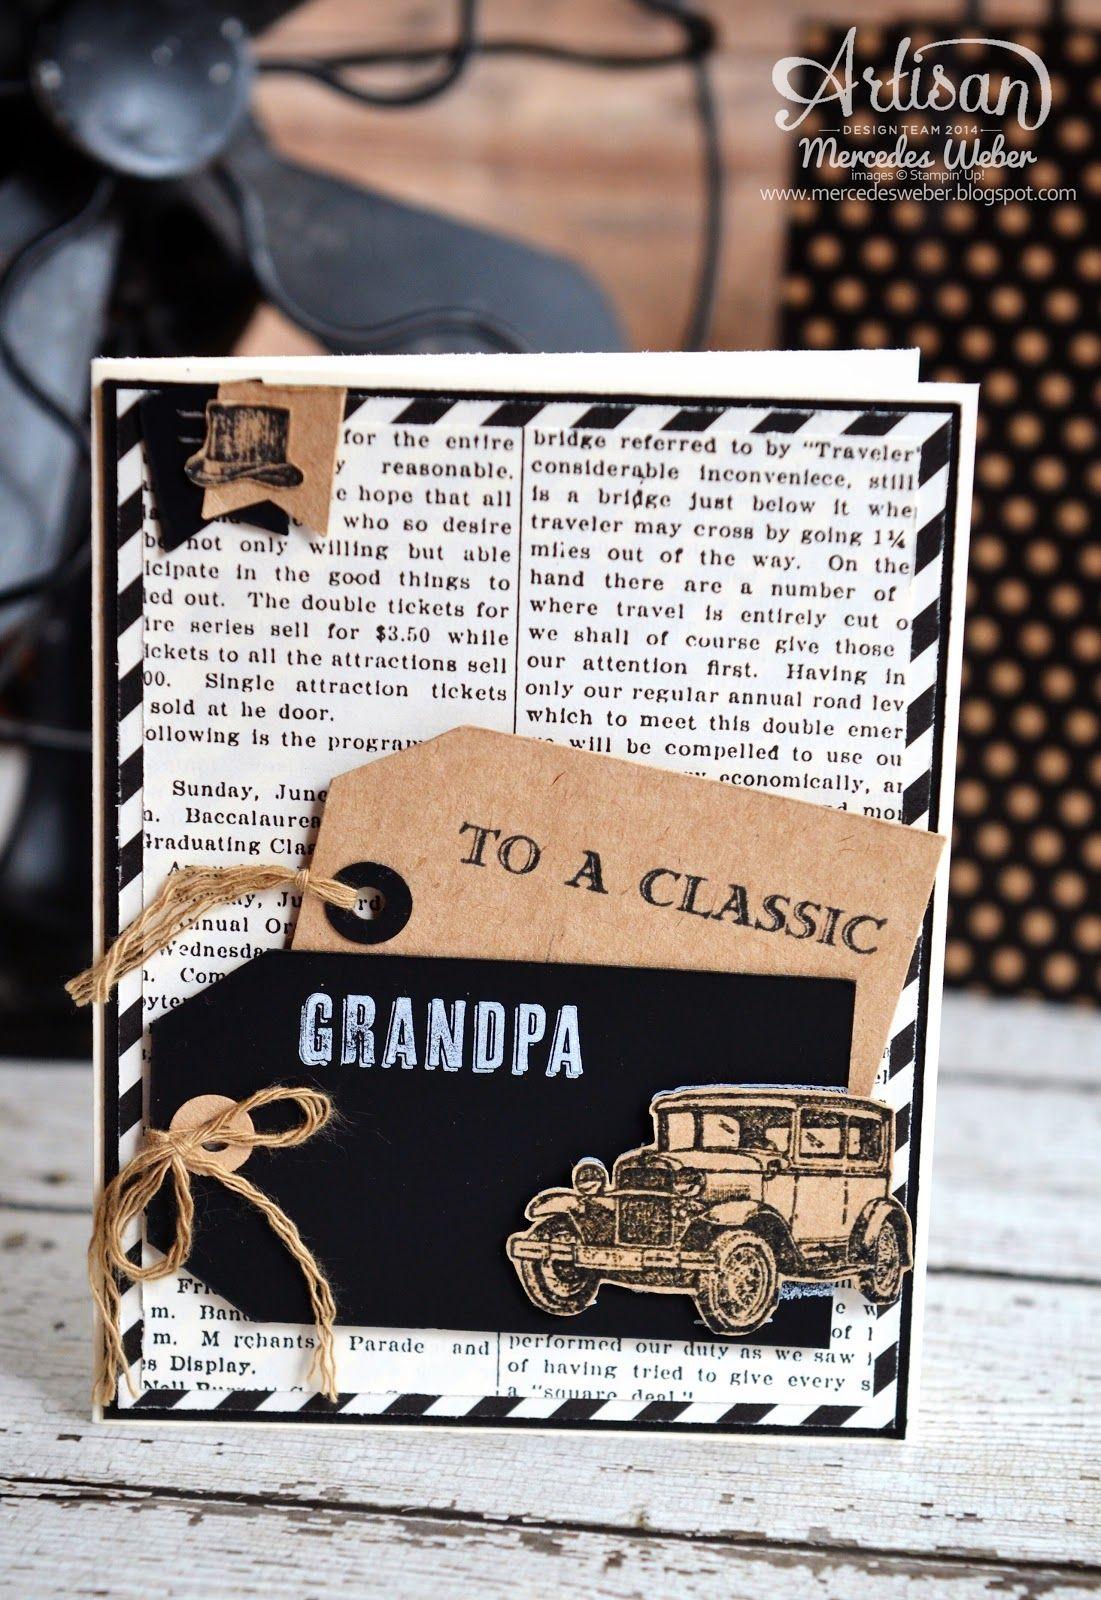 Mercedes weber my paper paradise stampin up artisan blog hop guy